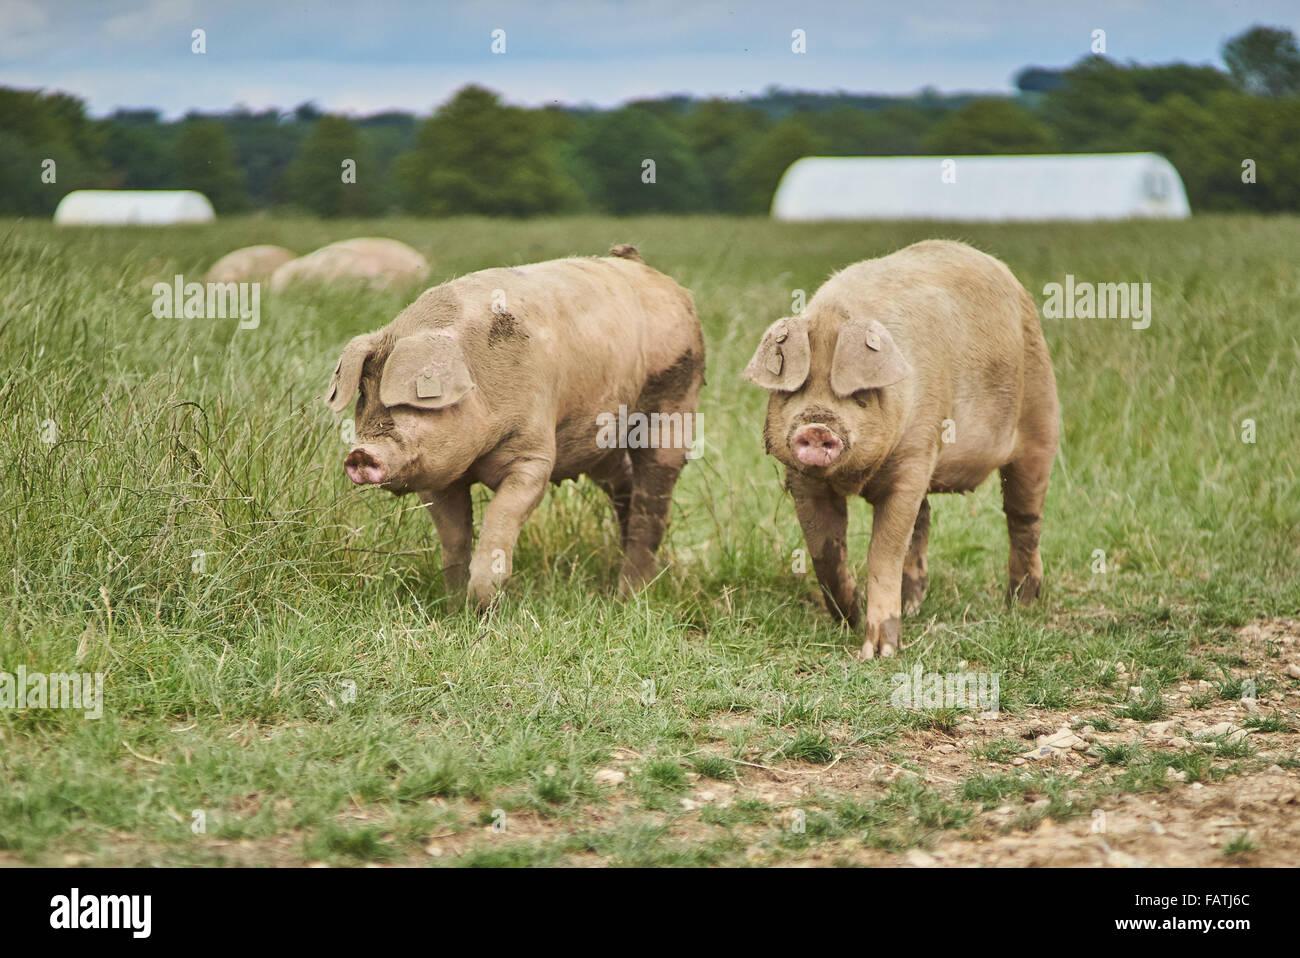 Two Organic Free Range Pigs walking in a grass field - Stock Image